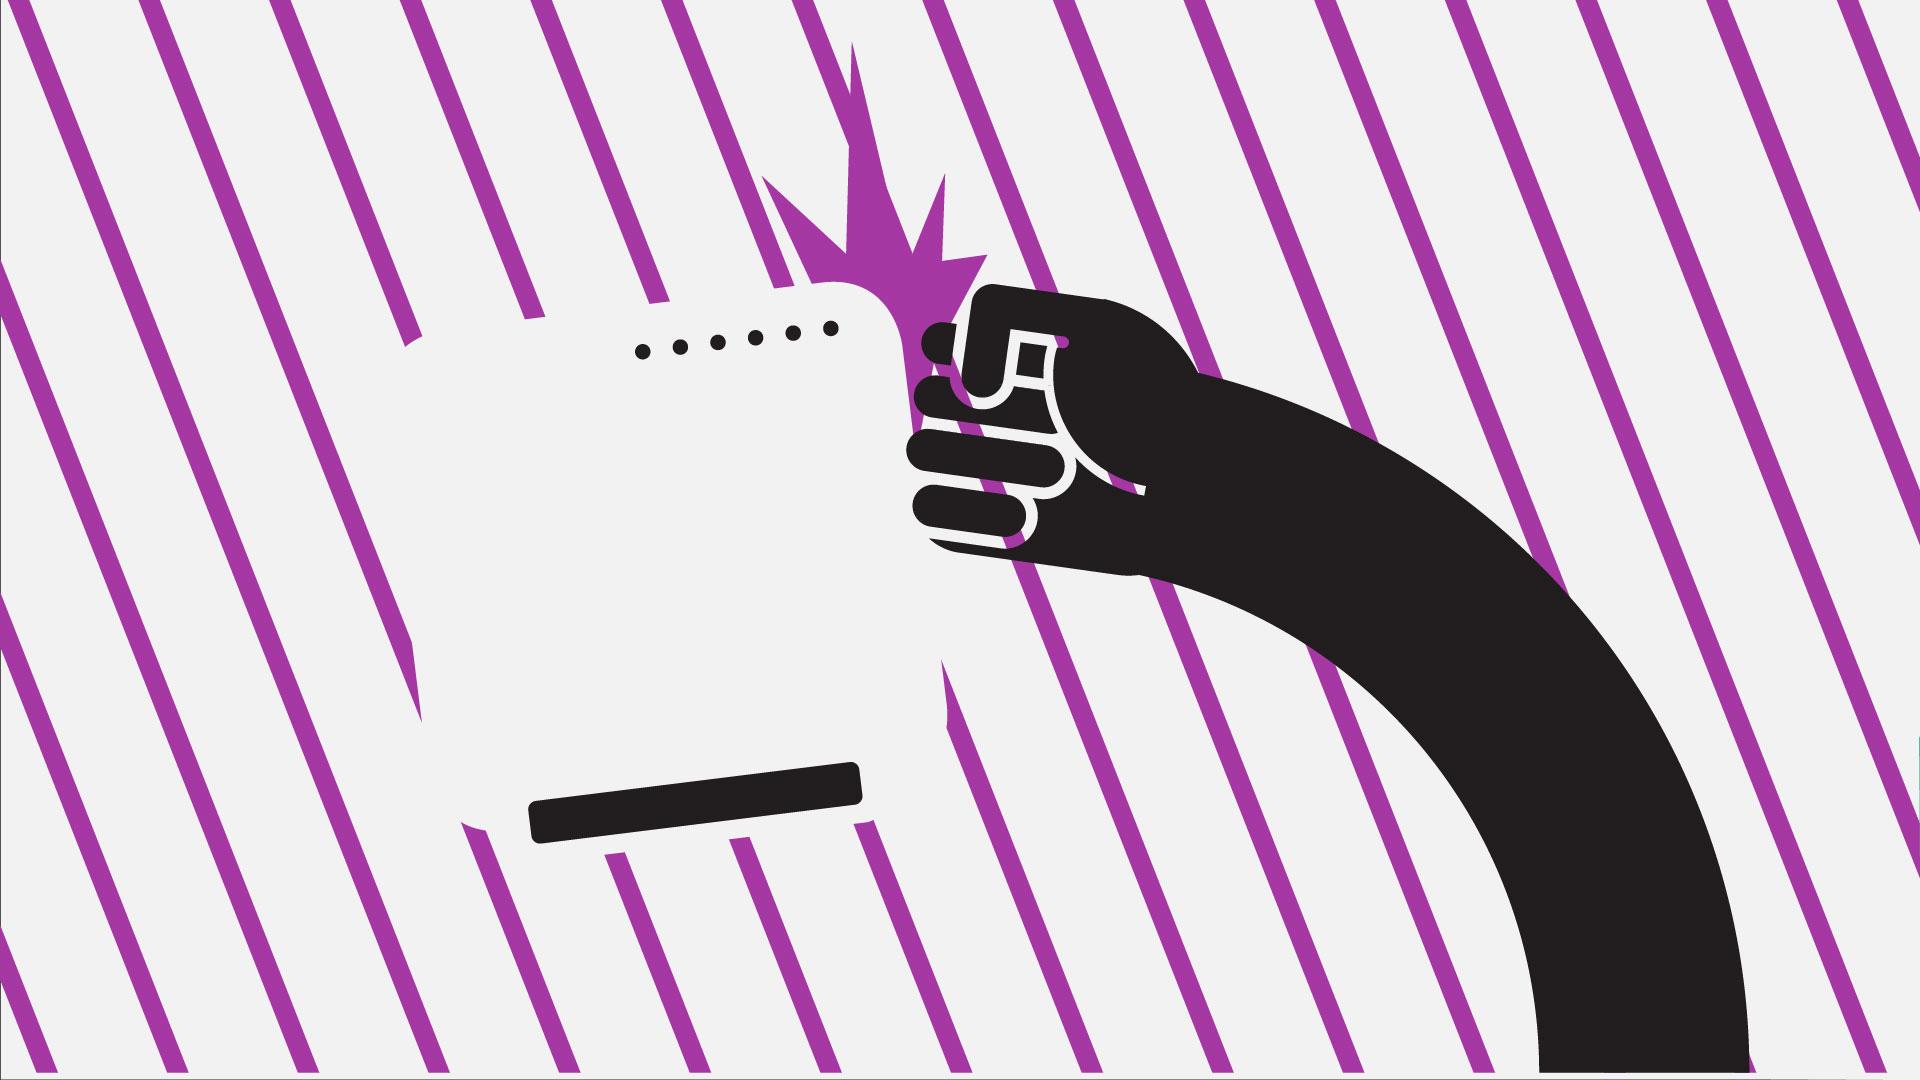 Op_Smart_Troubleshooting_16-12a.jpg